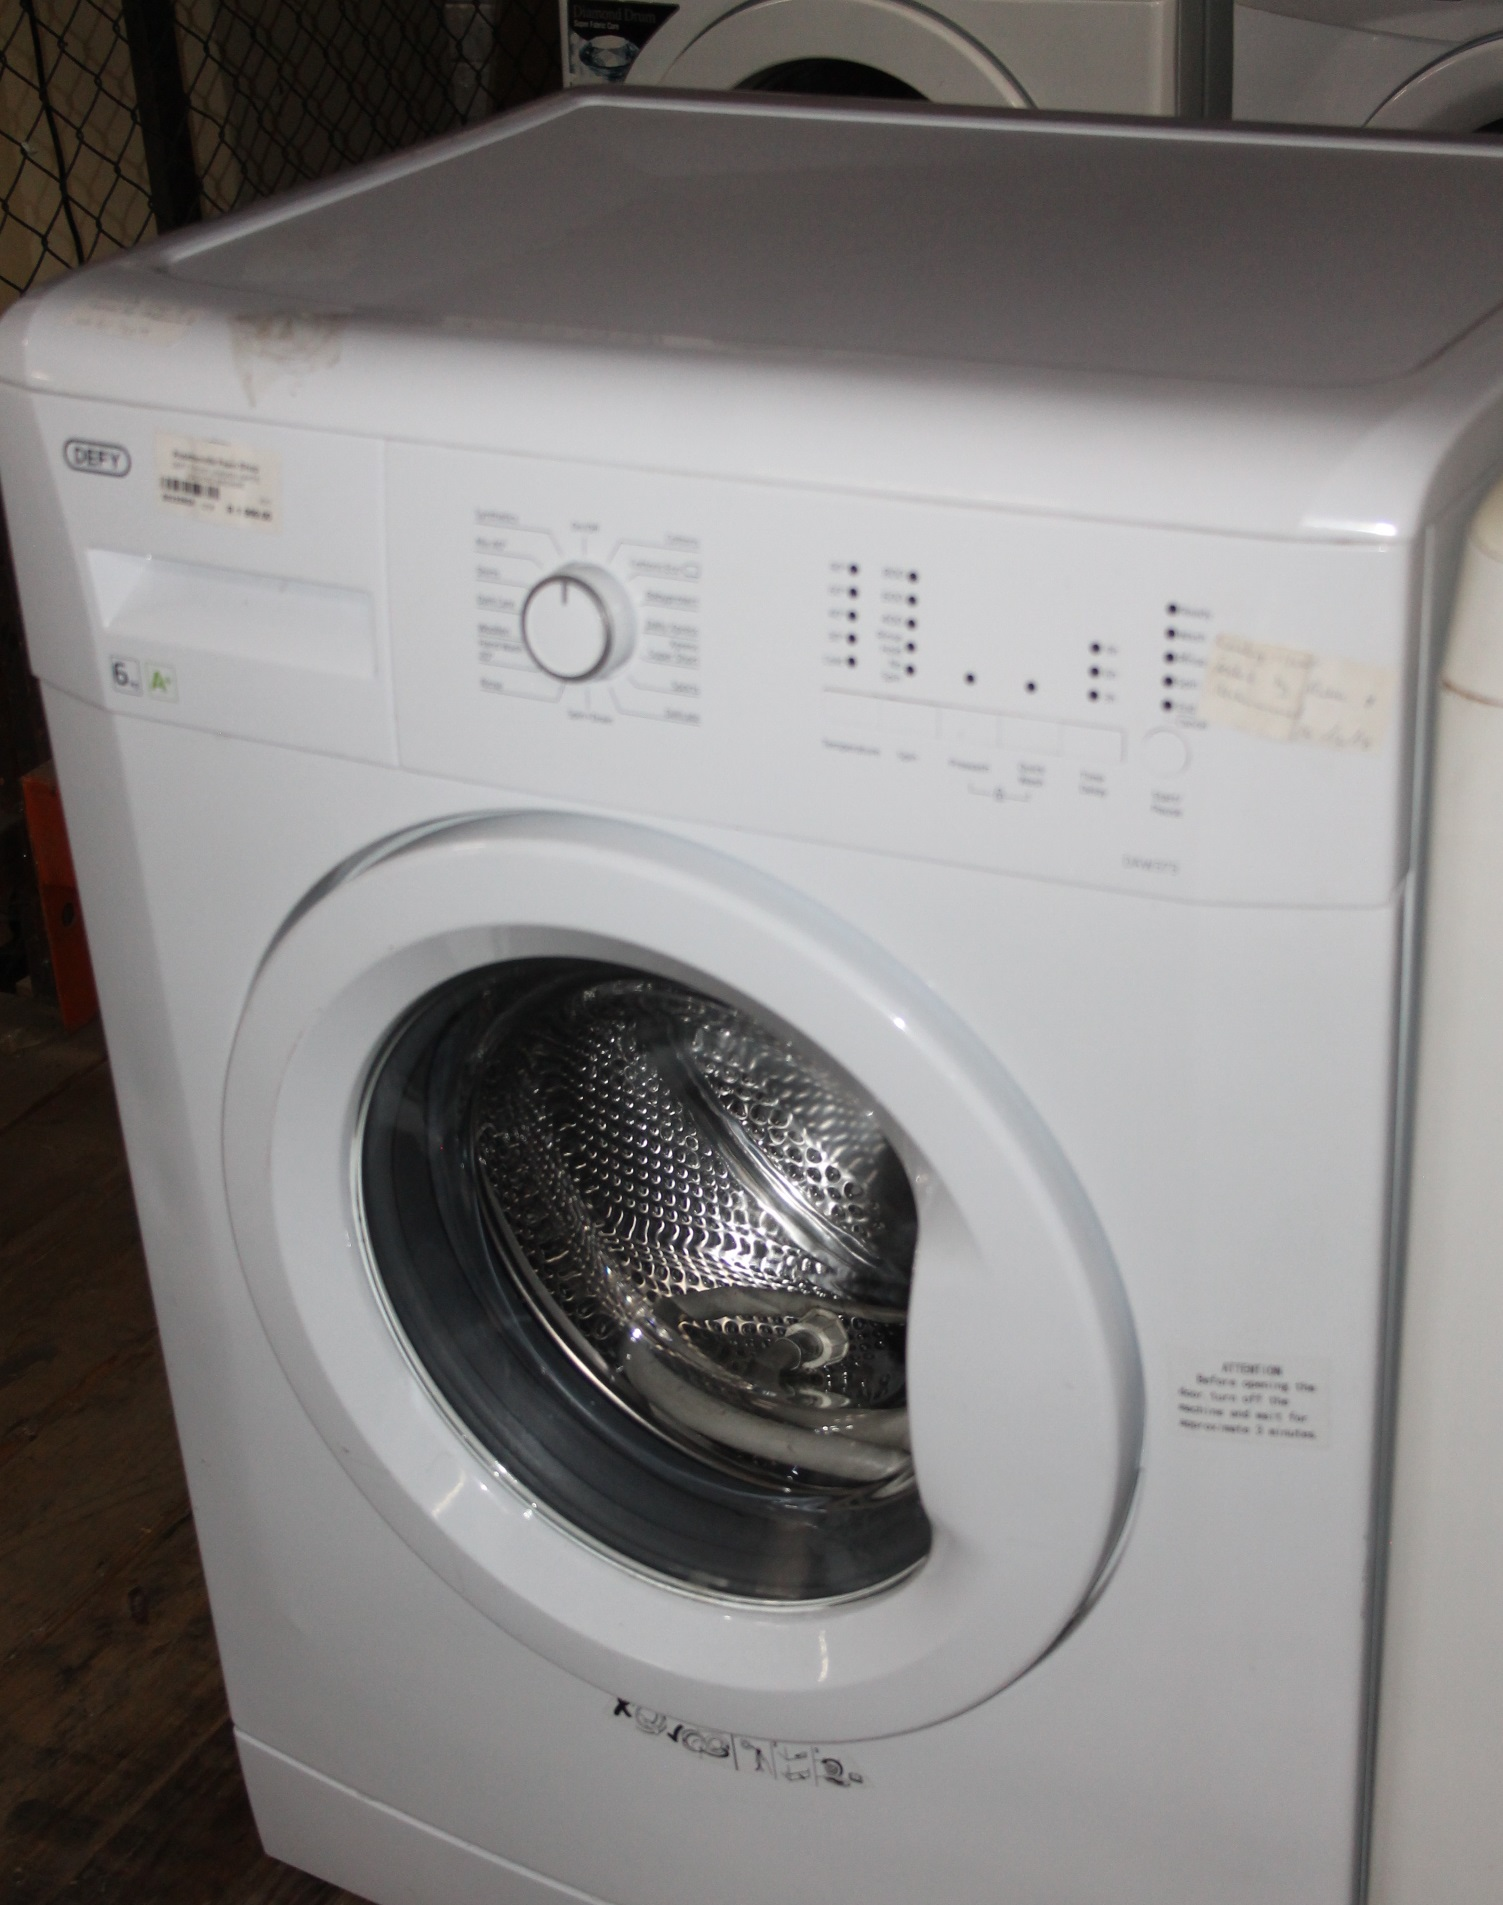 Defy front loader white washing machine S032382A #Rosettenvillepawnshop